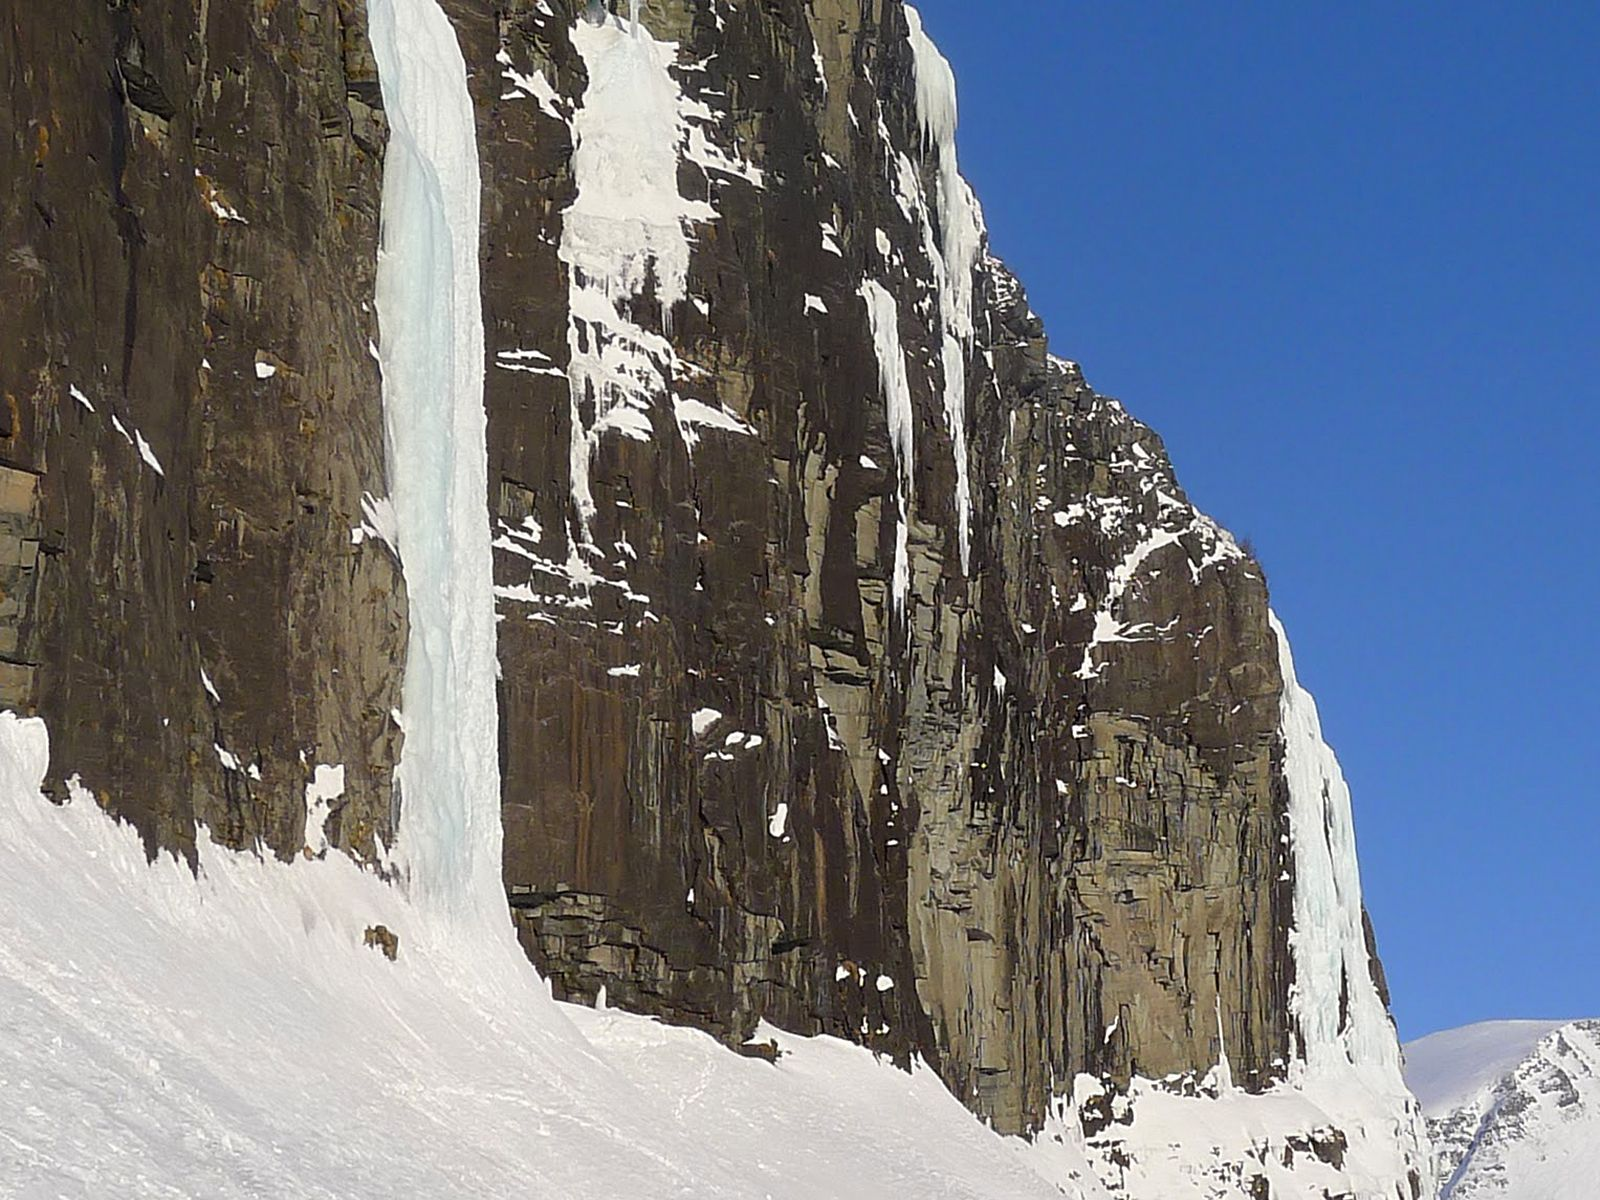 Водопад Виннуфоссен зимой